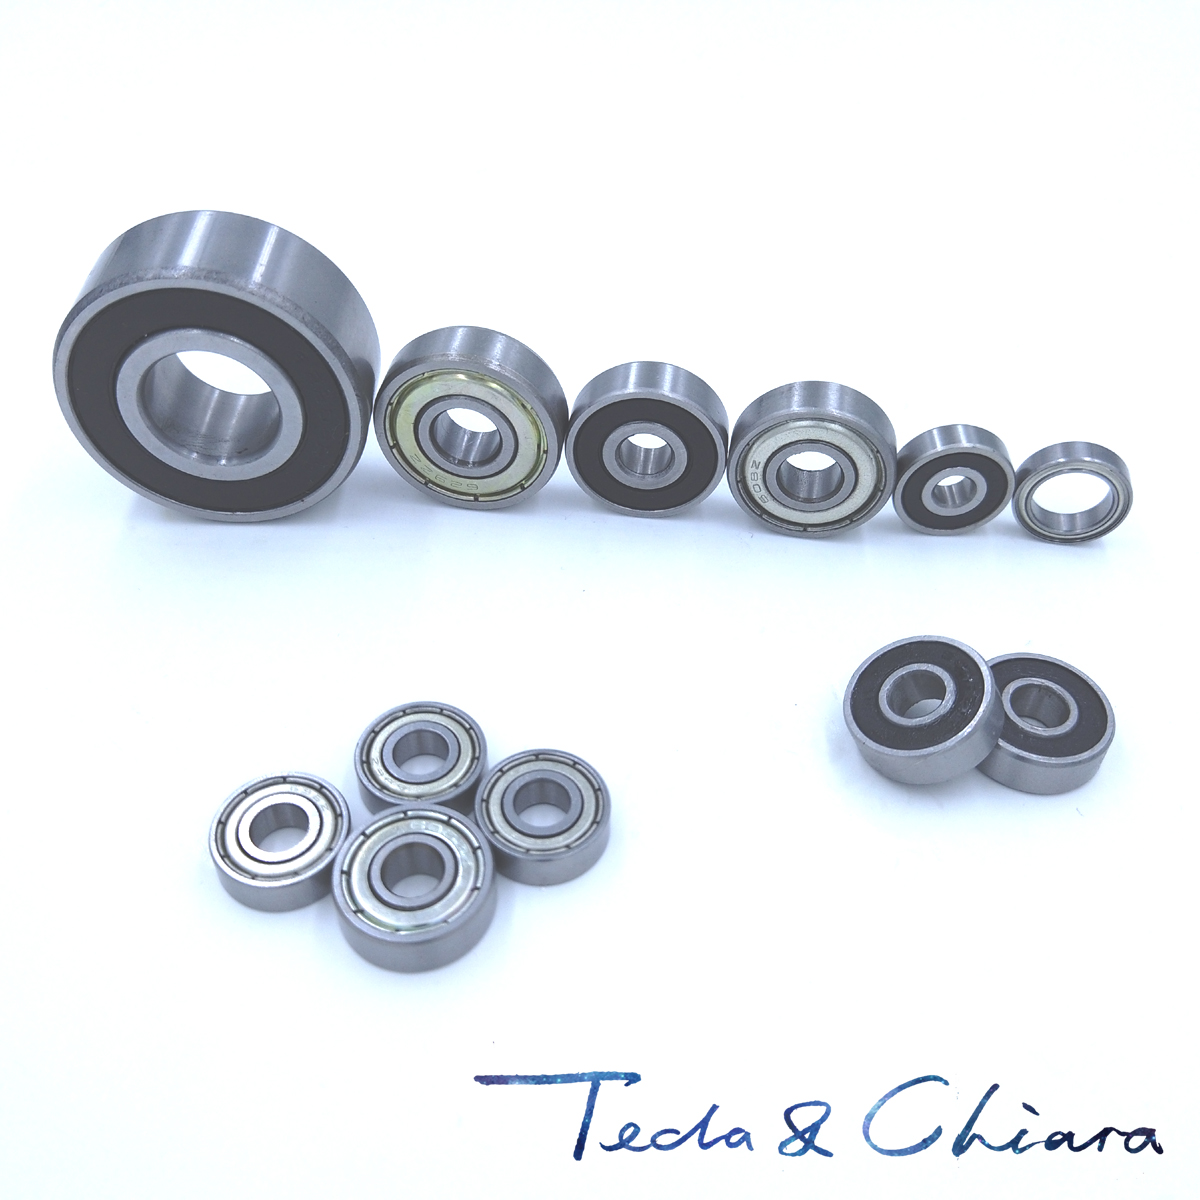 6200 6200ZZ 6200RS 6200-2Z 6200Z 6200-2RS ZZ RS RZ 2RZ Deep Groove Ball Bearings 10 X 30 X 9mm